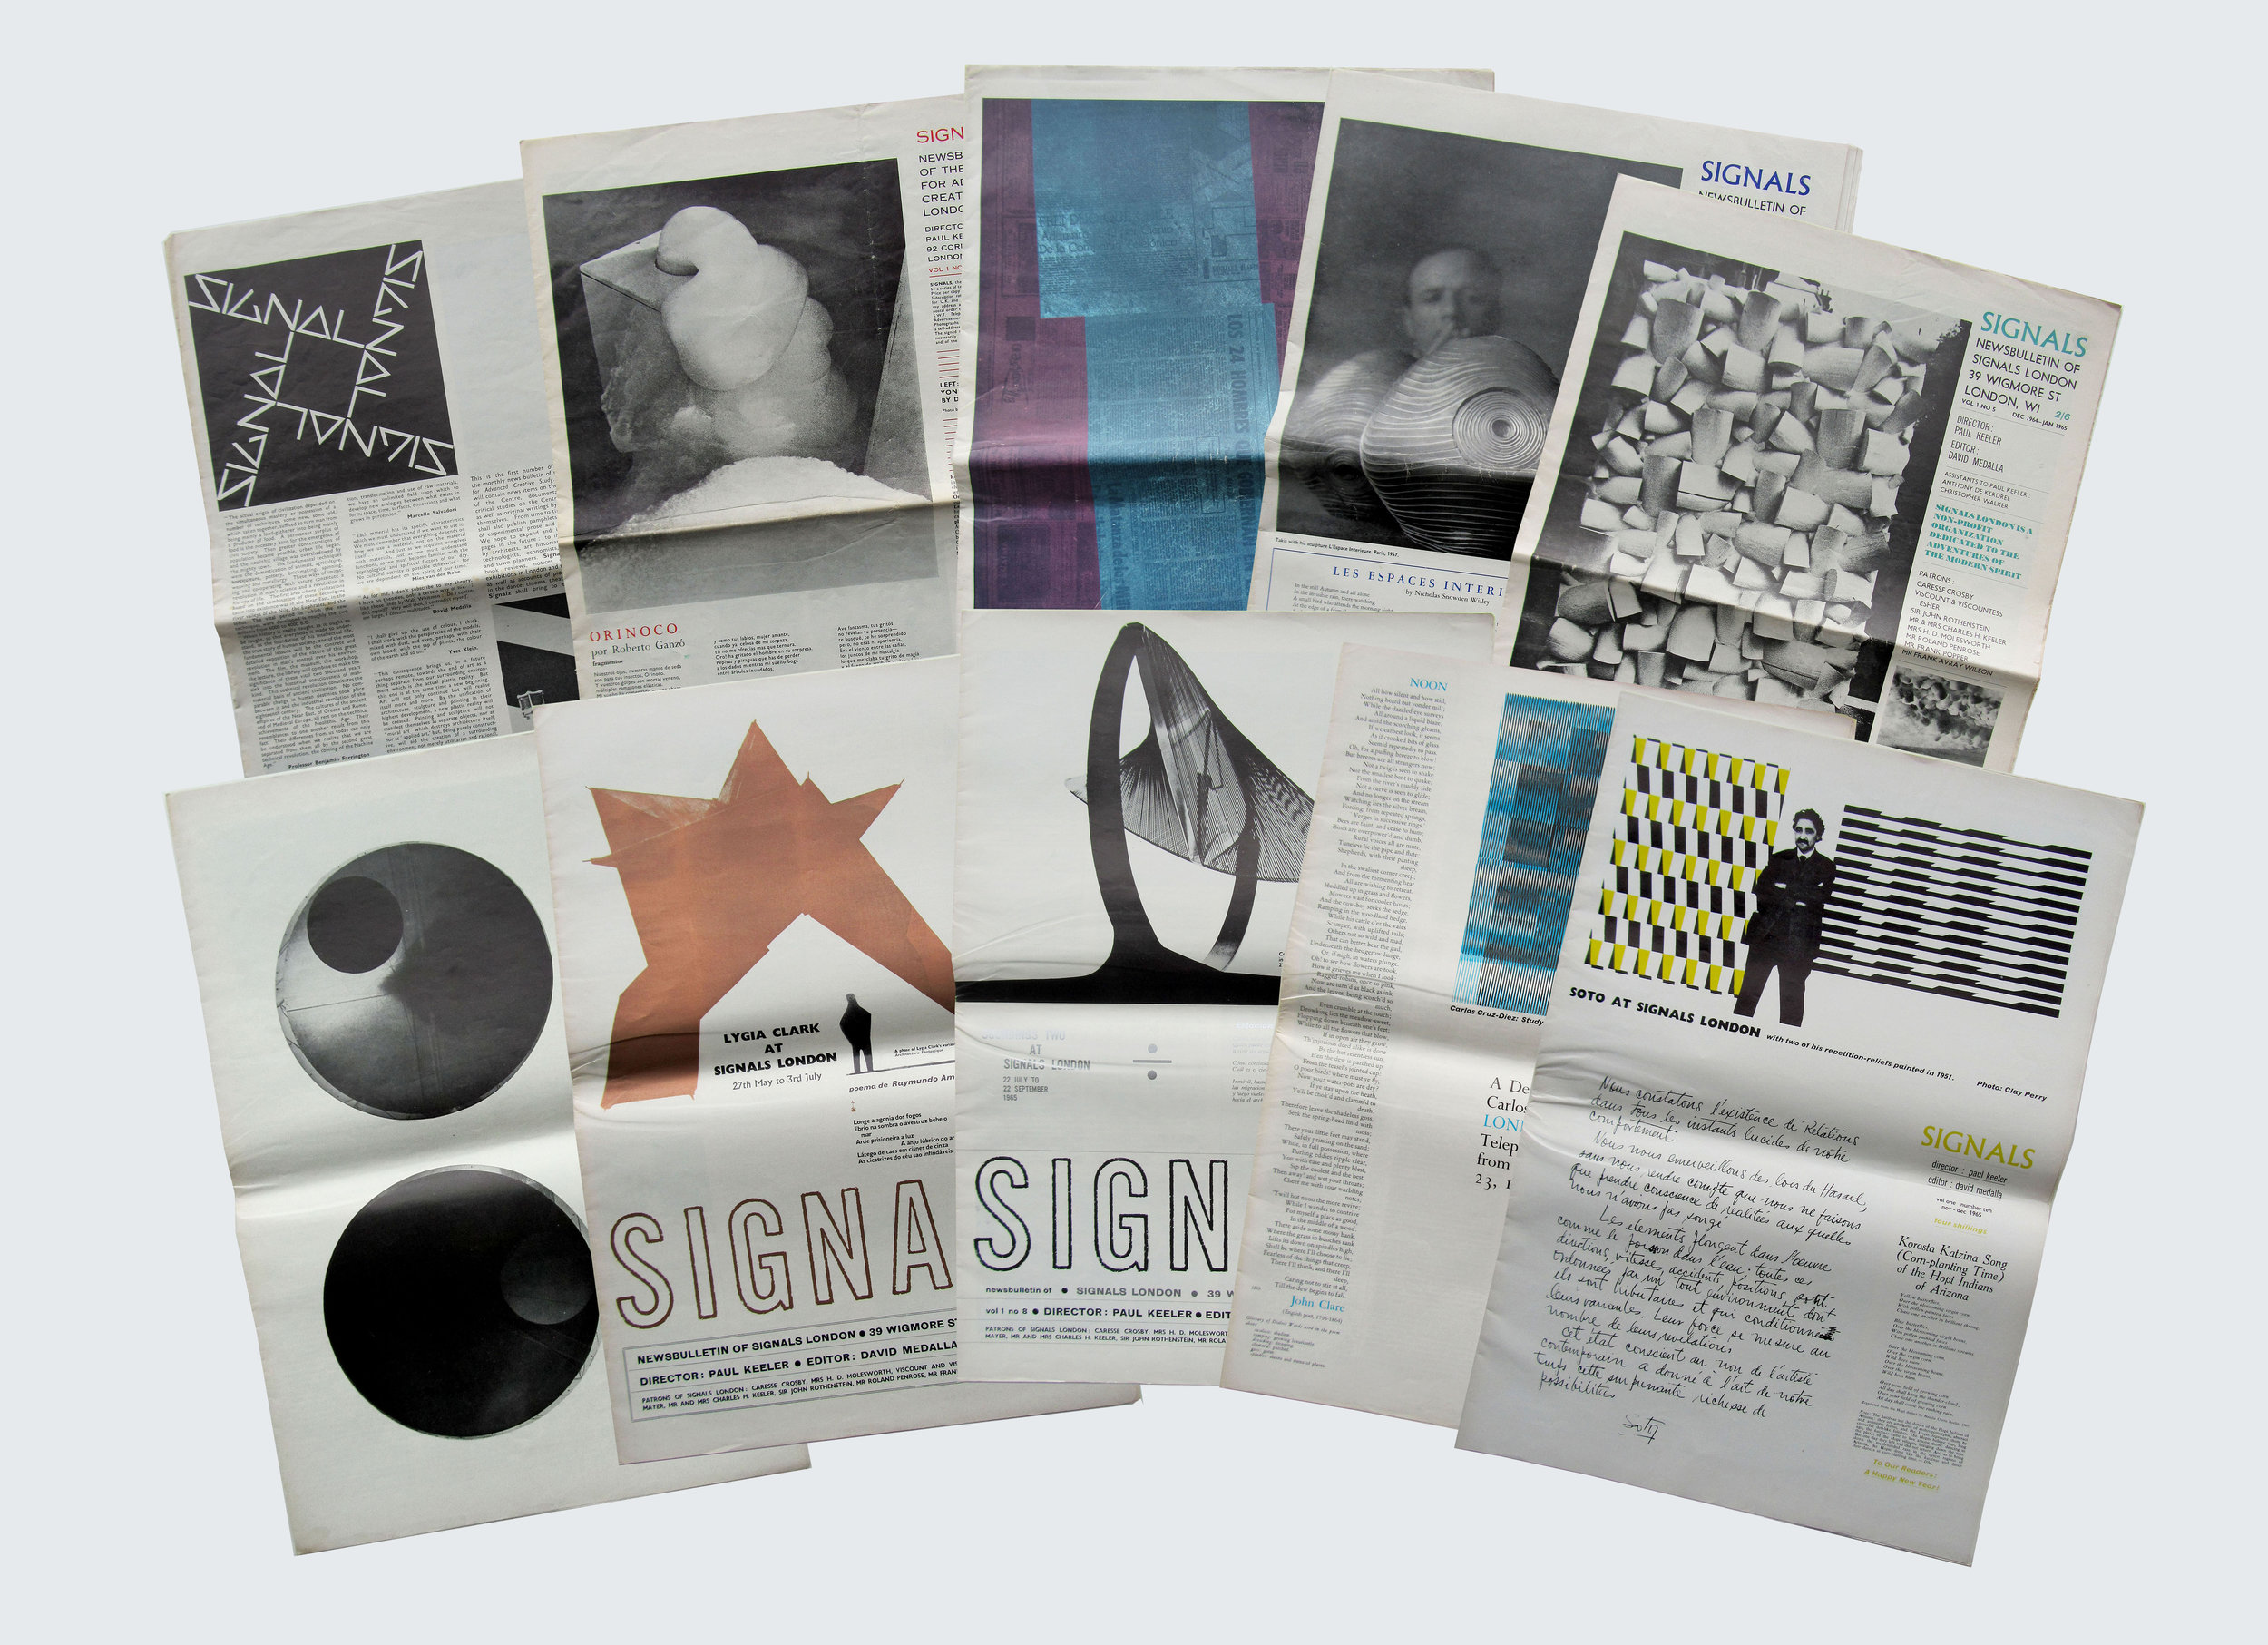 Signals_Gallery_Newsbulletins.jpg